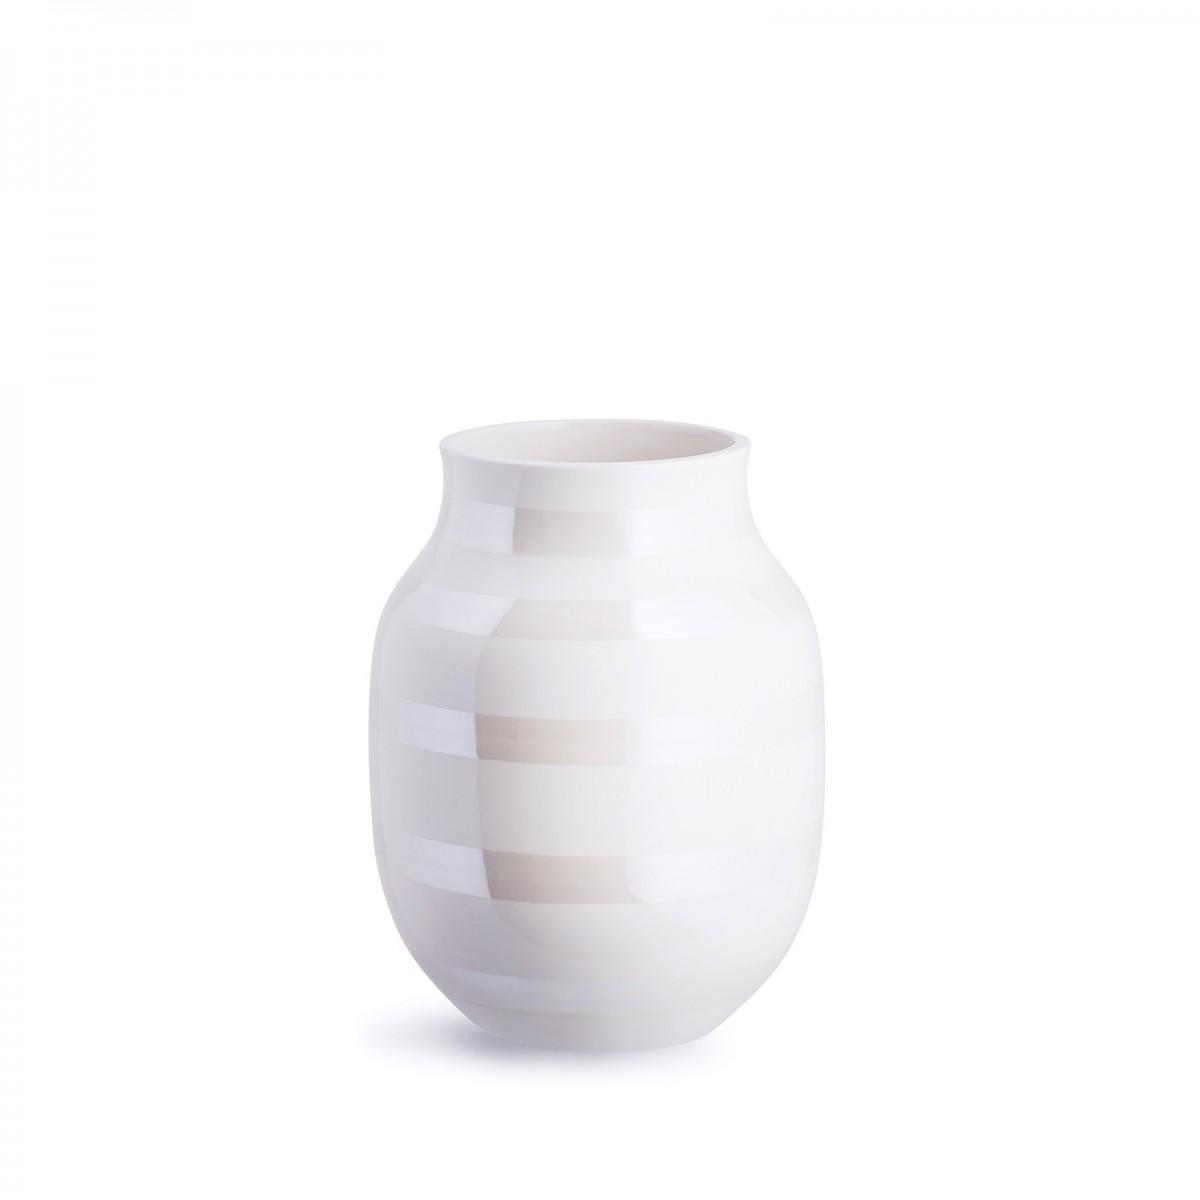 KÄHLER Omaggio vase perlemor 20 cm.